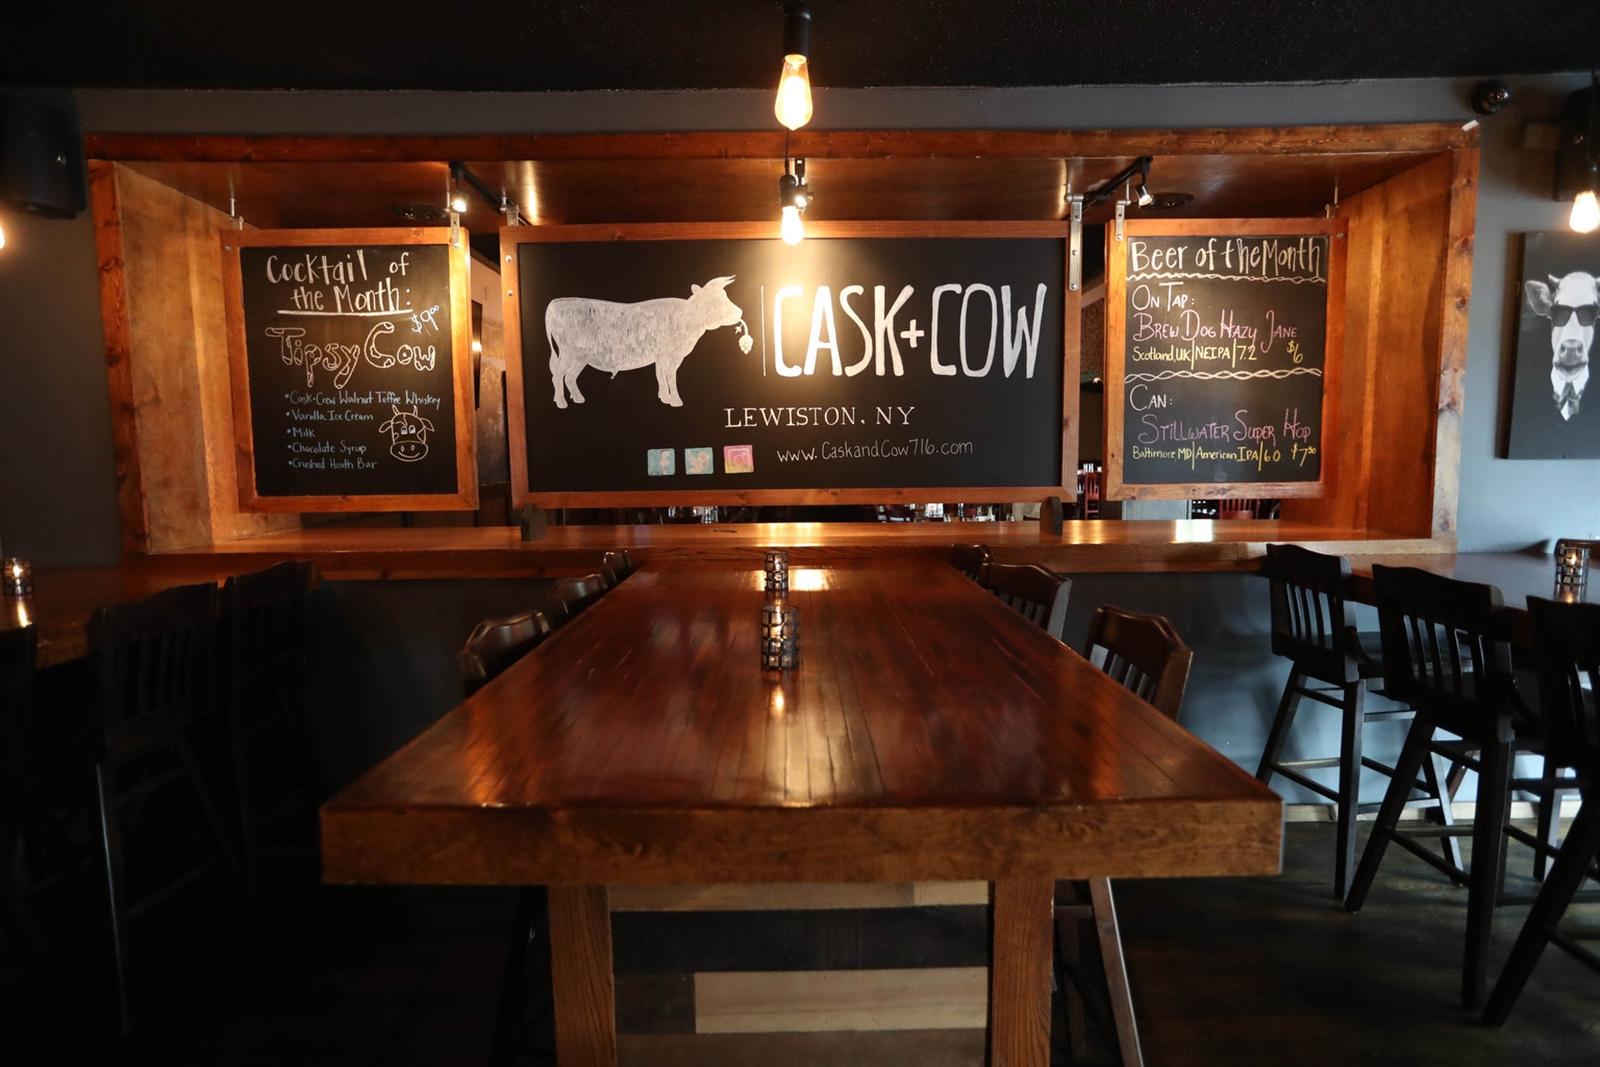 Cask & Cow